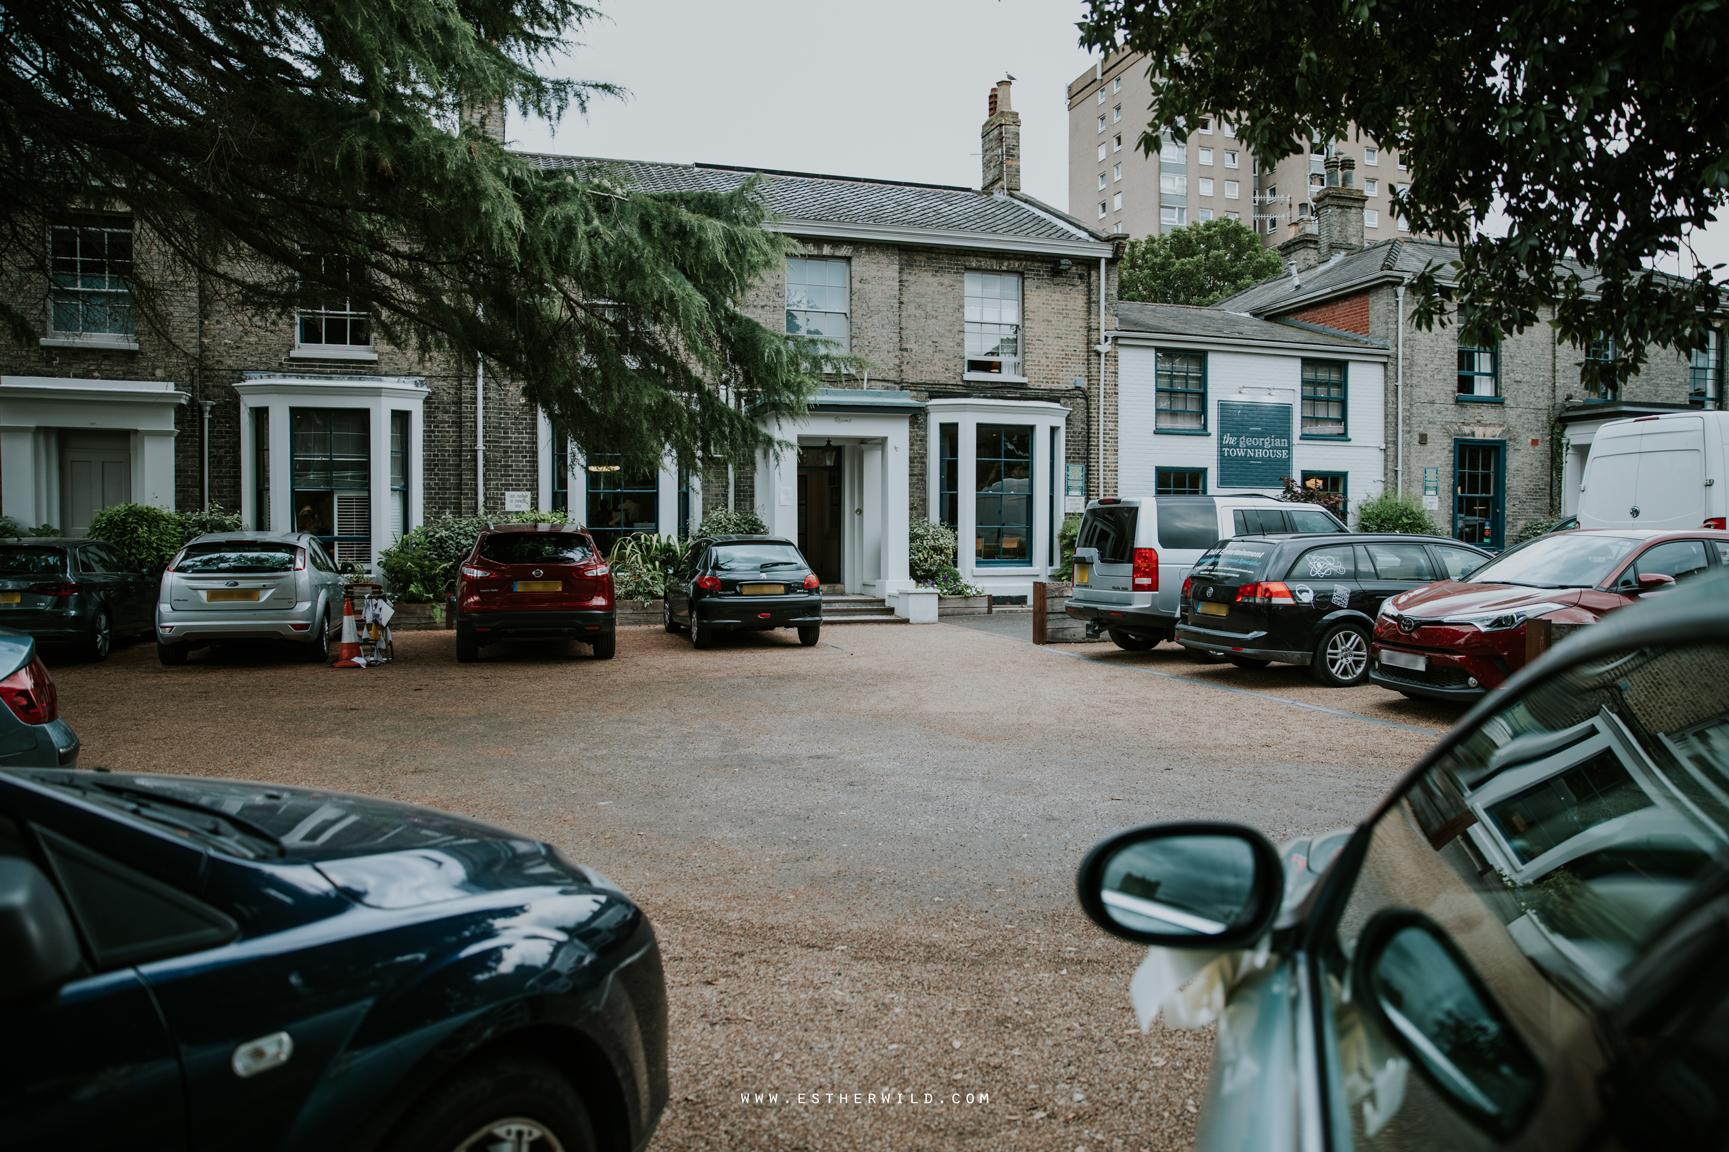 The_Georgian_Townhouse_Wedding_Norwich_Esther_Wild_Photographer_3R8A2014.jpg